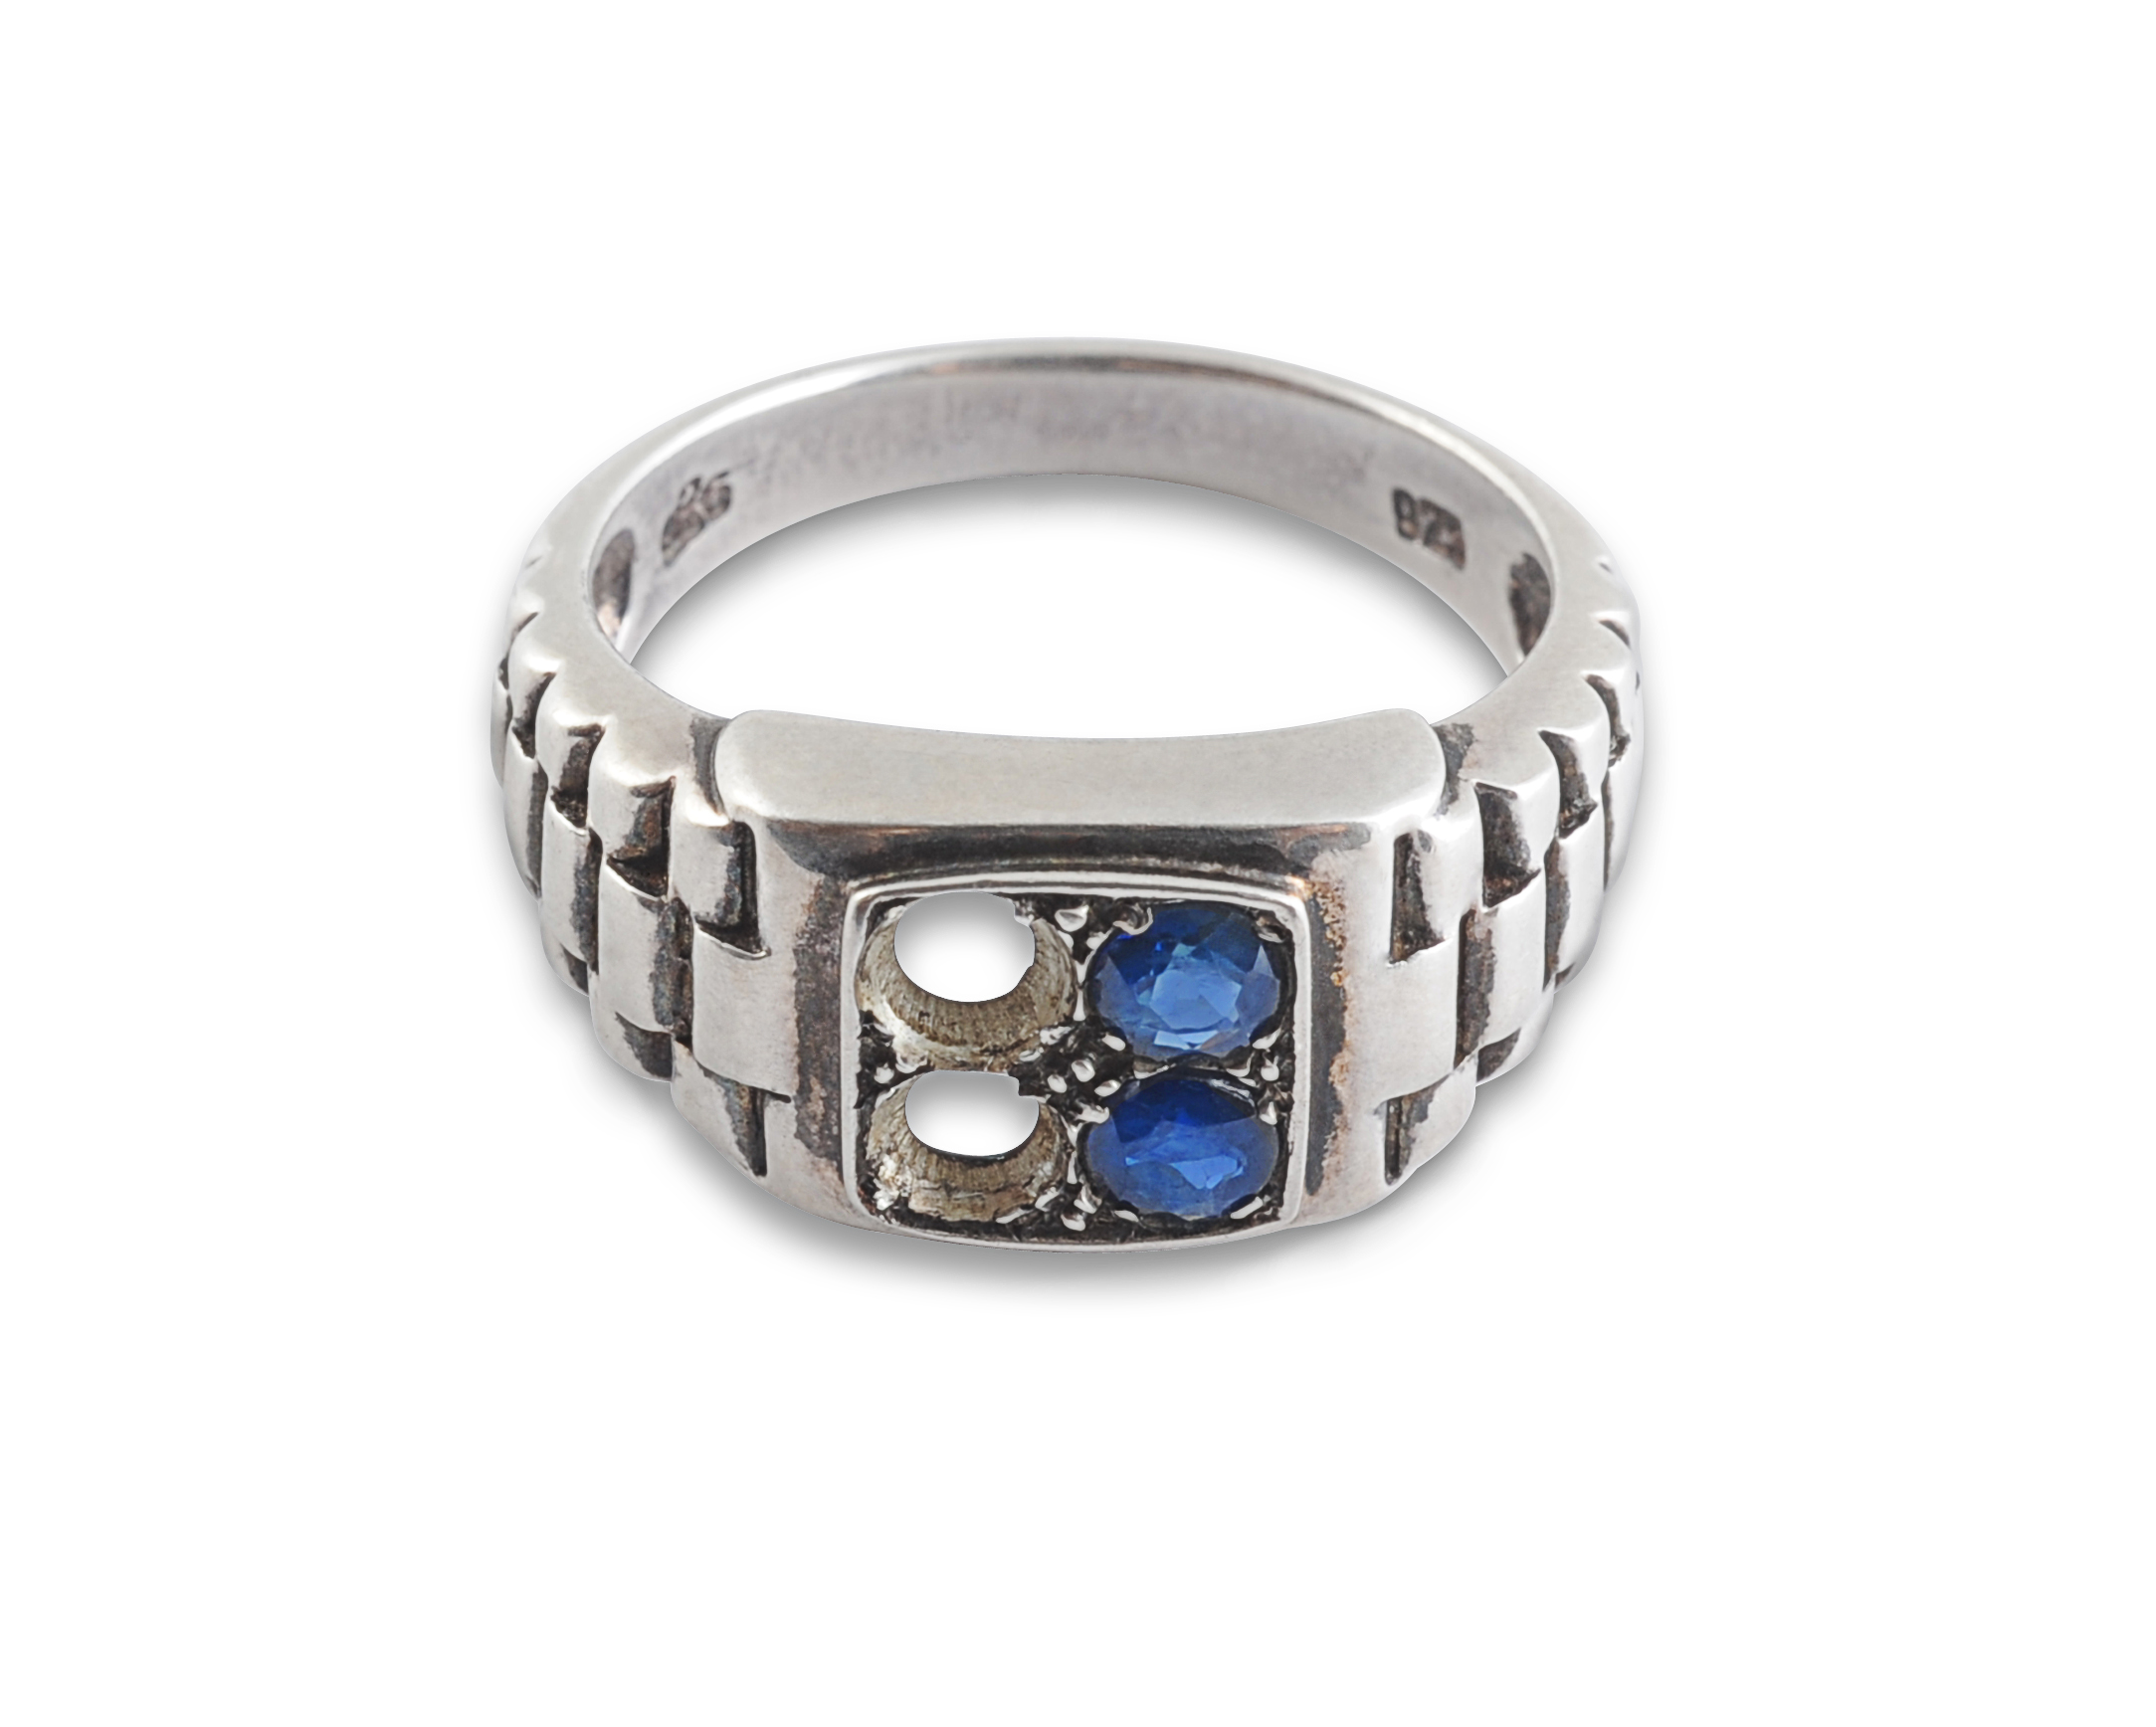 Redesigned jewellery